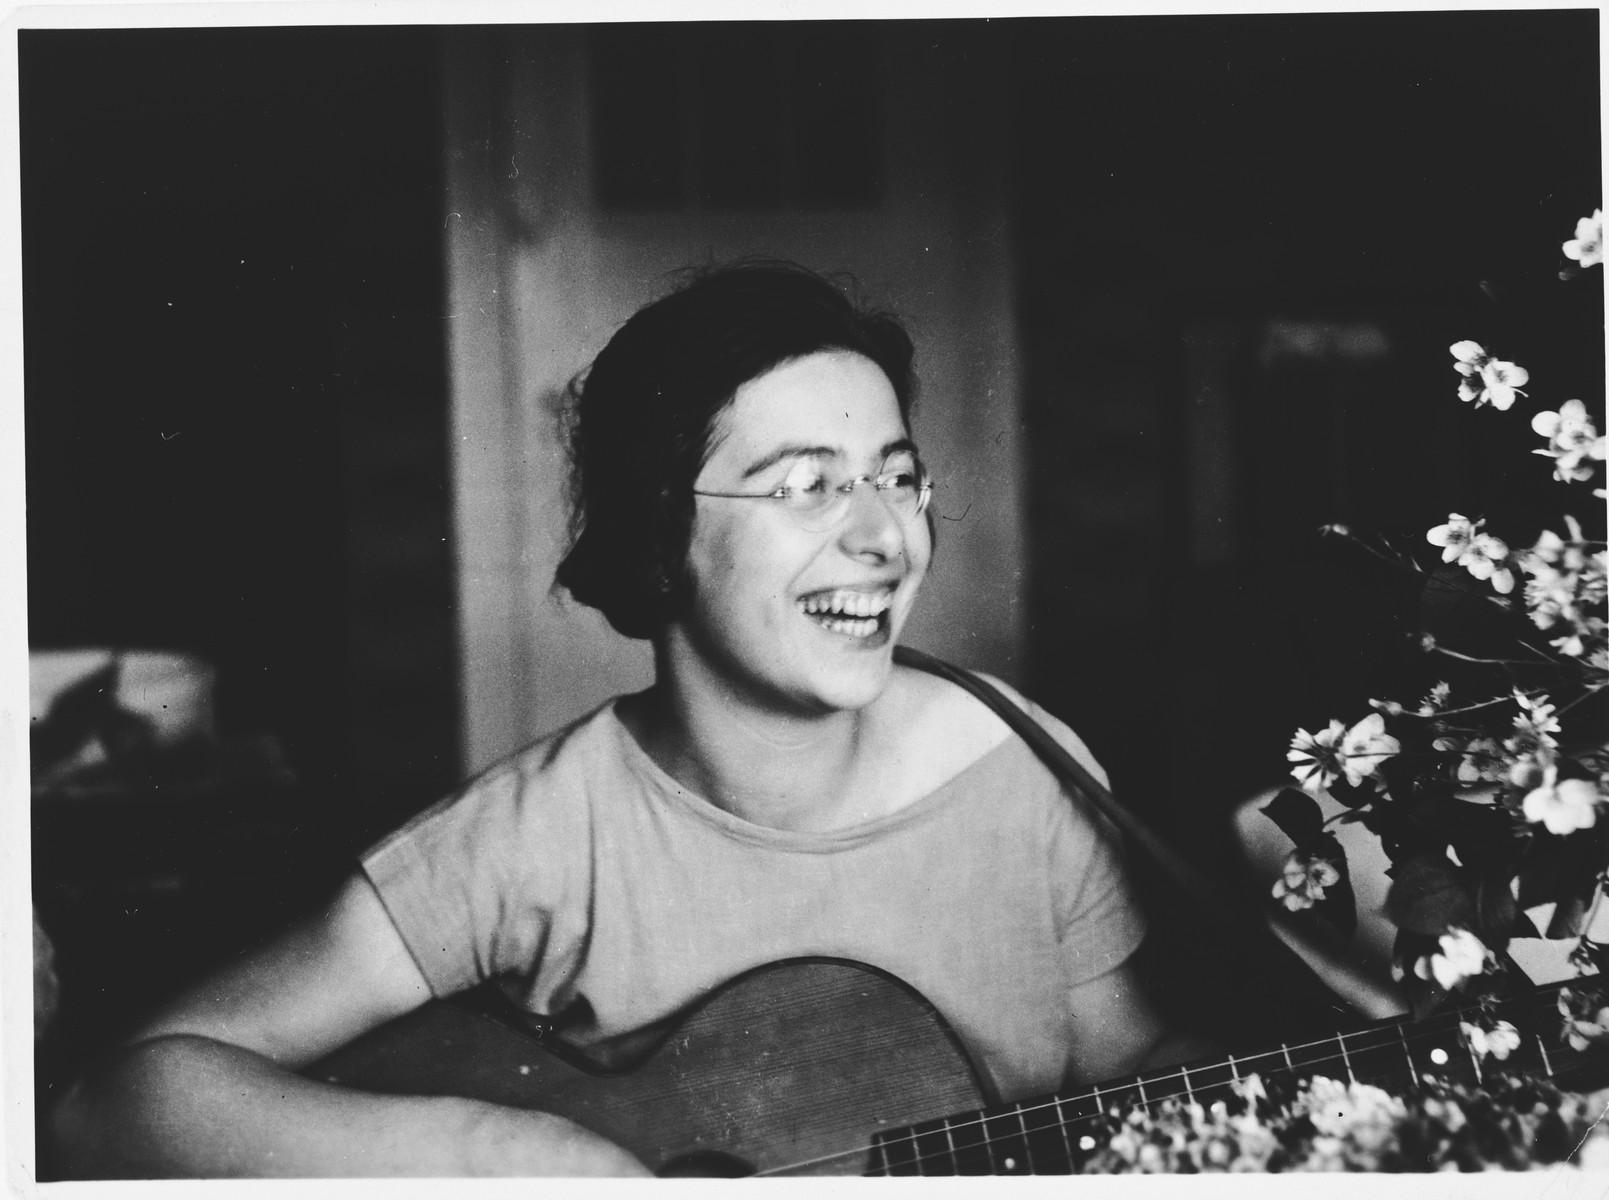 Berta Spiro plays her guitar.